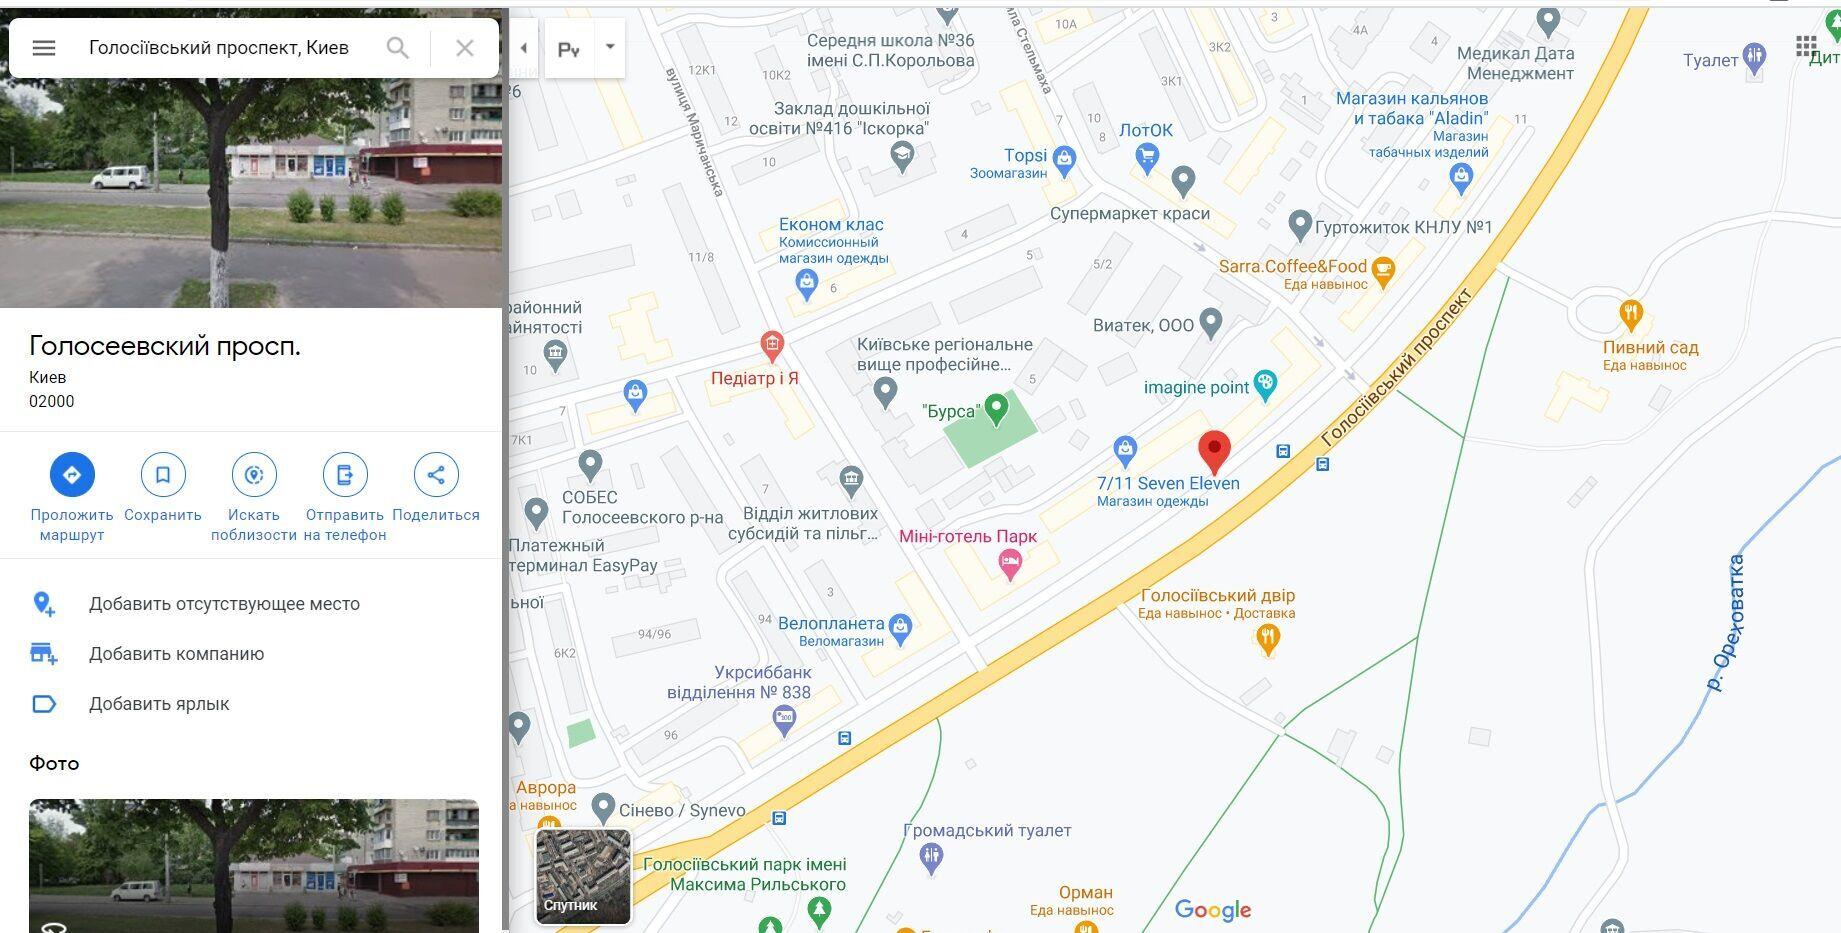 Голосеевский проспект на карте Киева